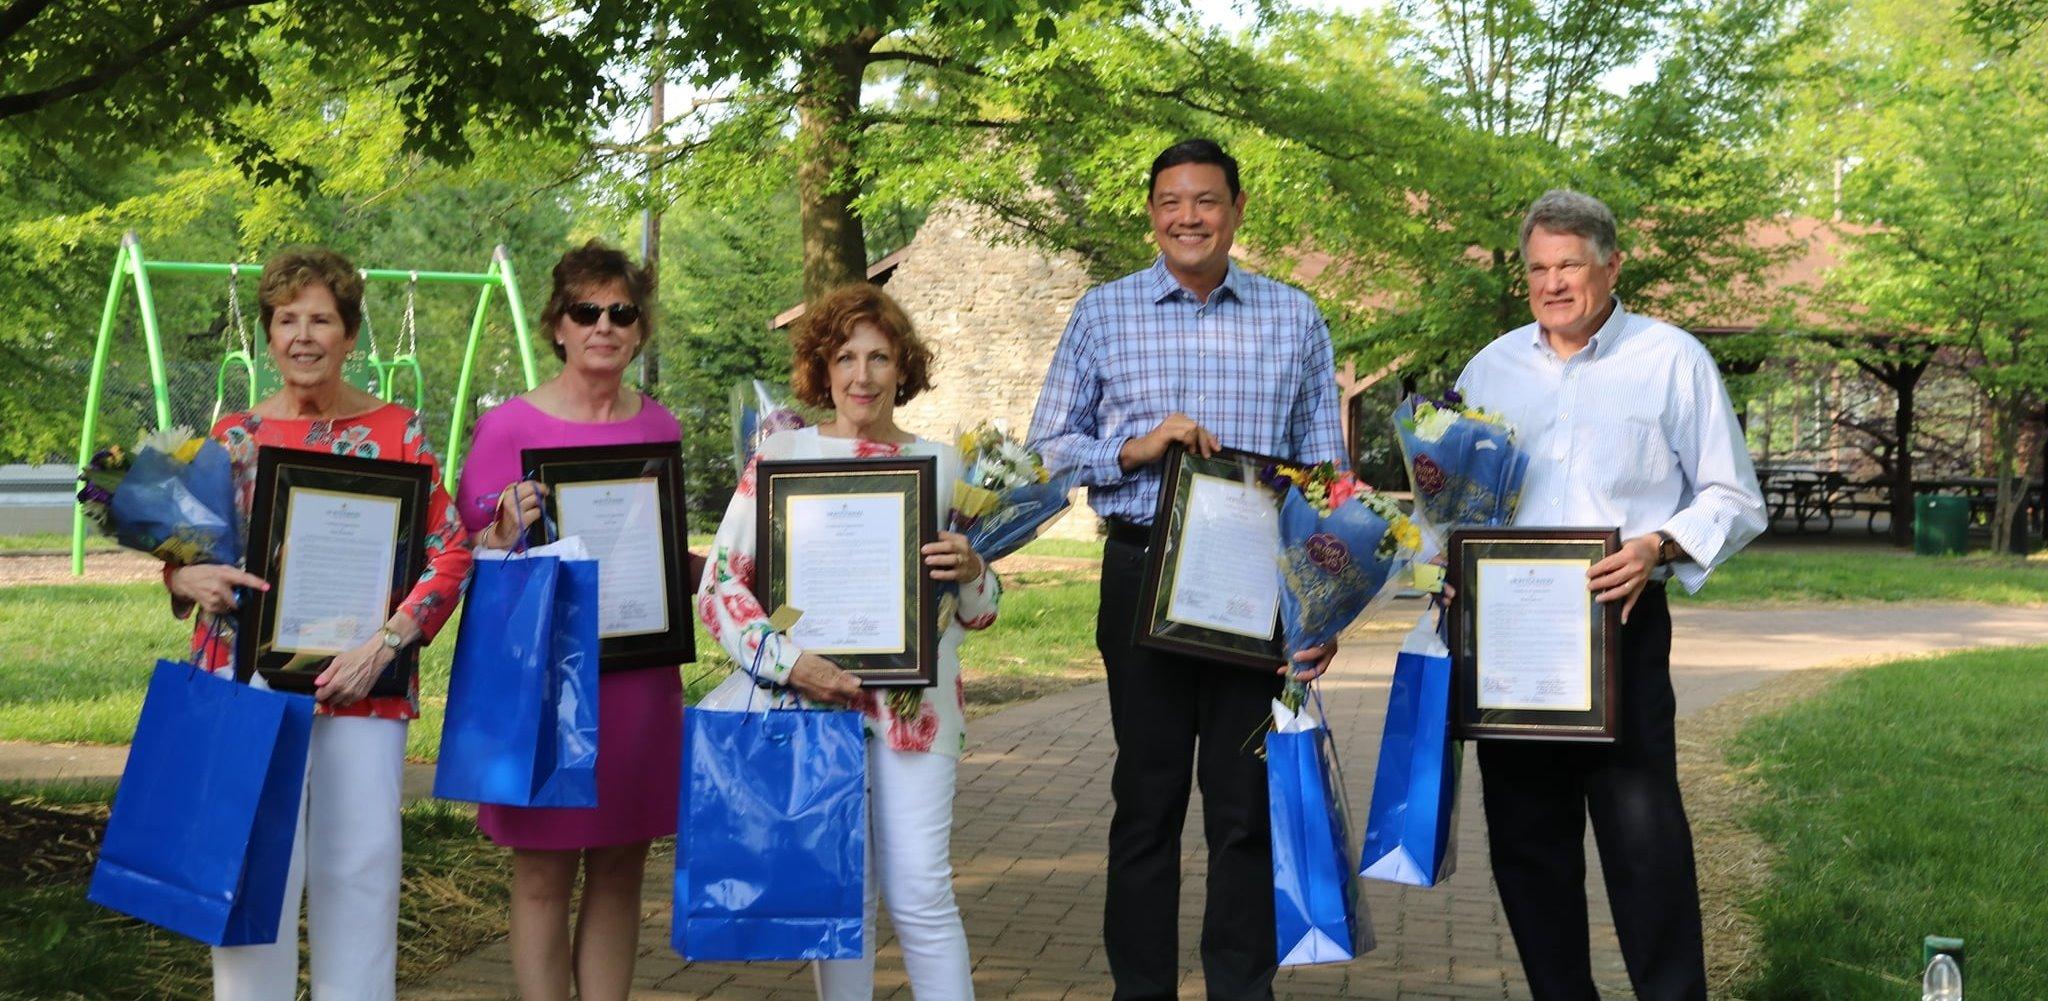 2021 Volunteer Walk of Fame